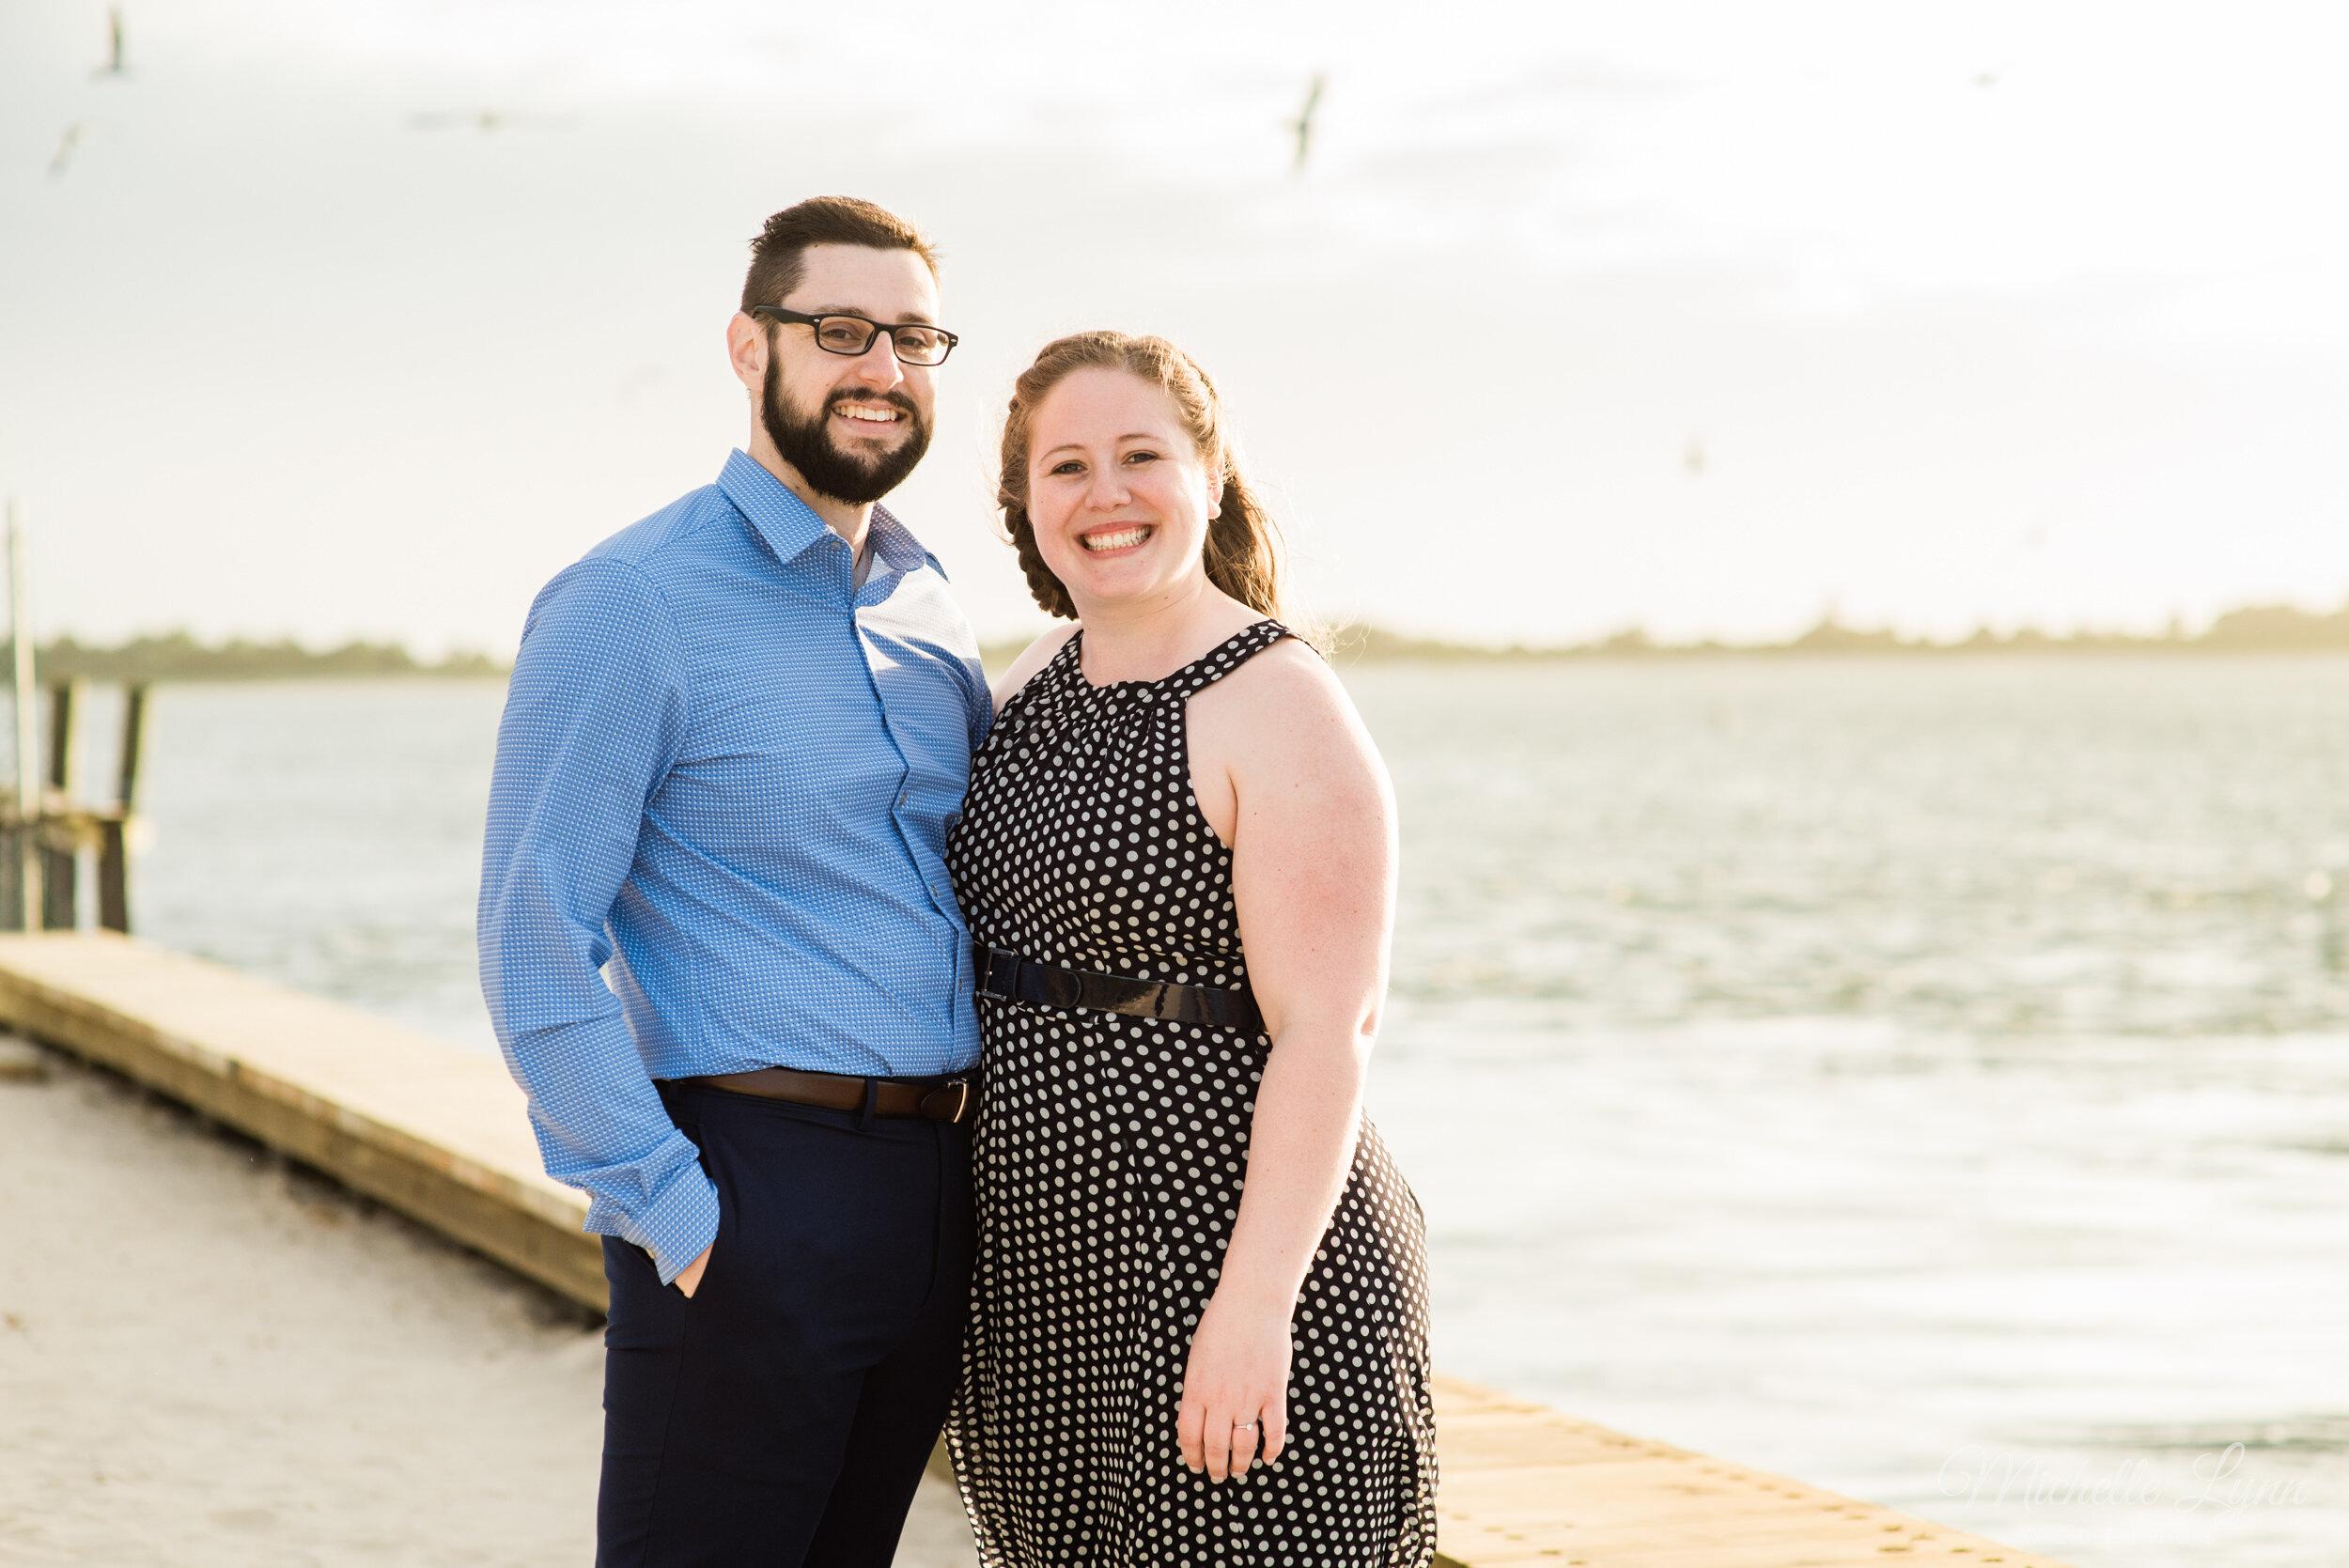 barnegat-lighthouse-engagement-photos-michelle-lynn-weddings-11.jpg